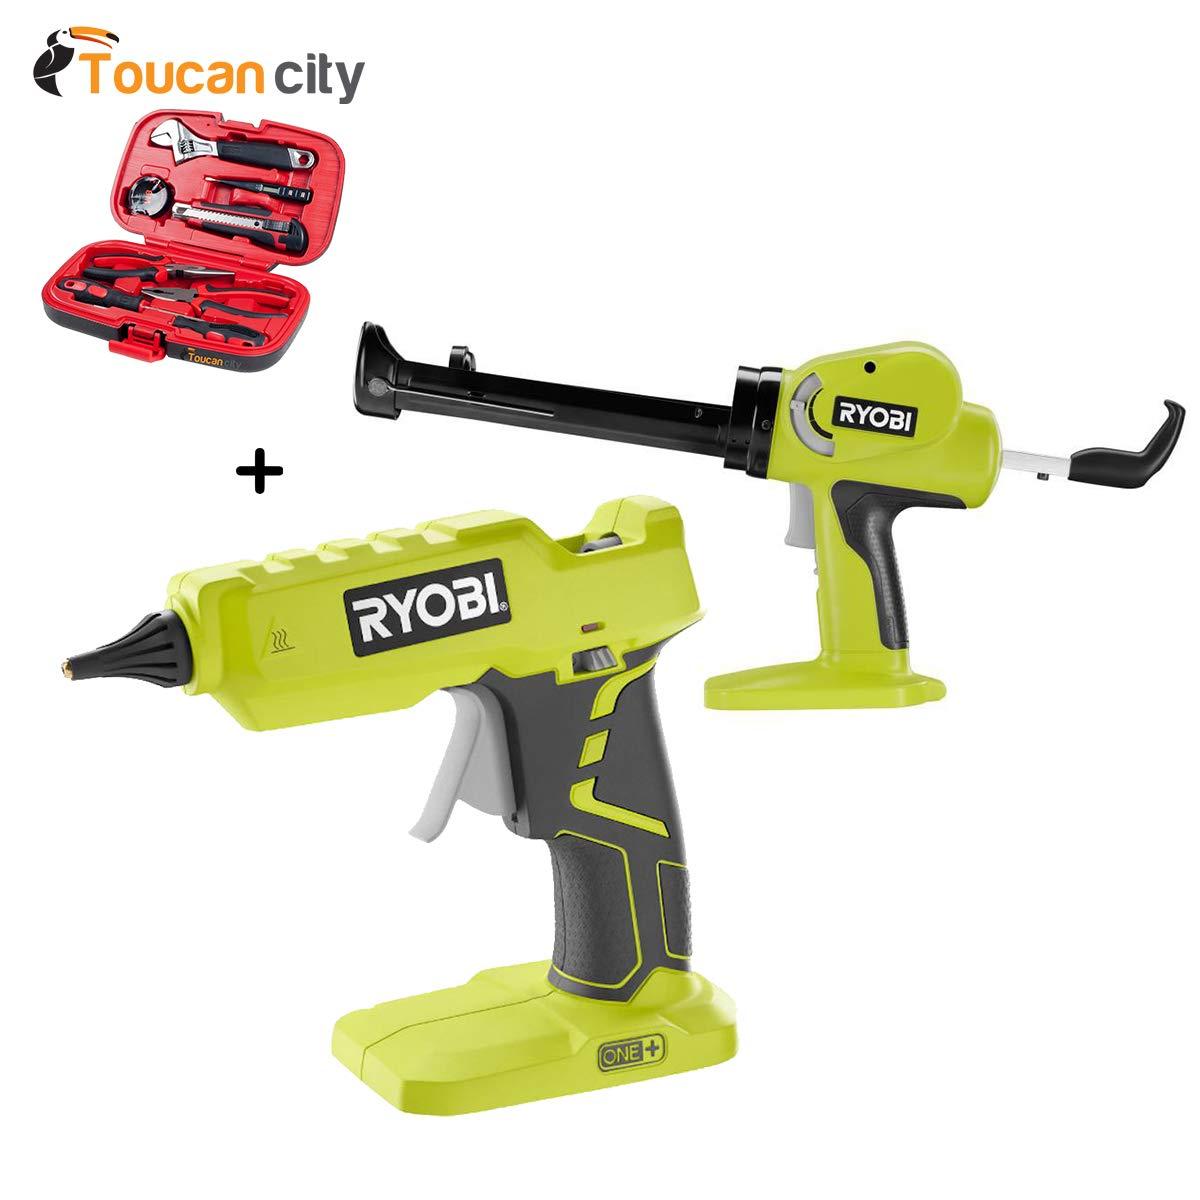 Toucan City Tool Kit (9-Piece) and RYOBI Full Size Glue Gun (Tool-Only) with 3 General Purpose Glue Sticks with RYOBI Power Caulk and Adhesive Gun (Tool Only) P305+P310G